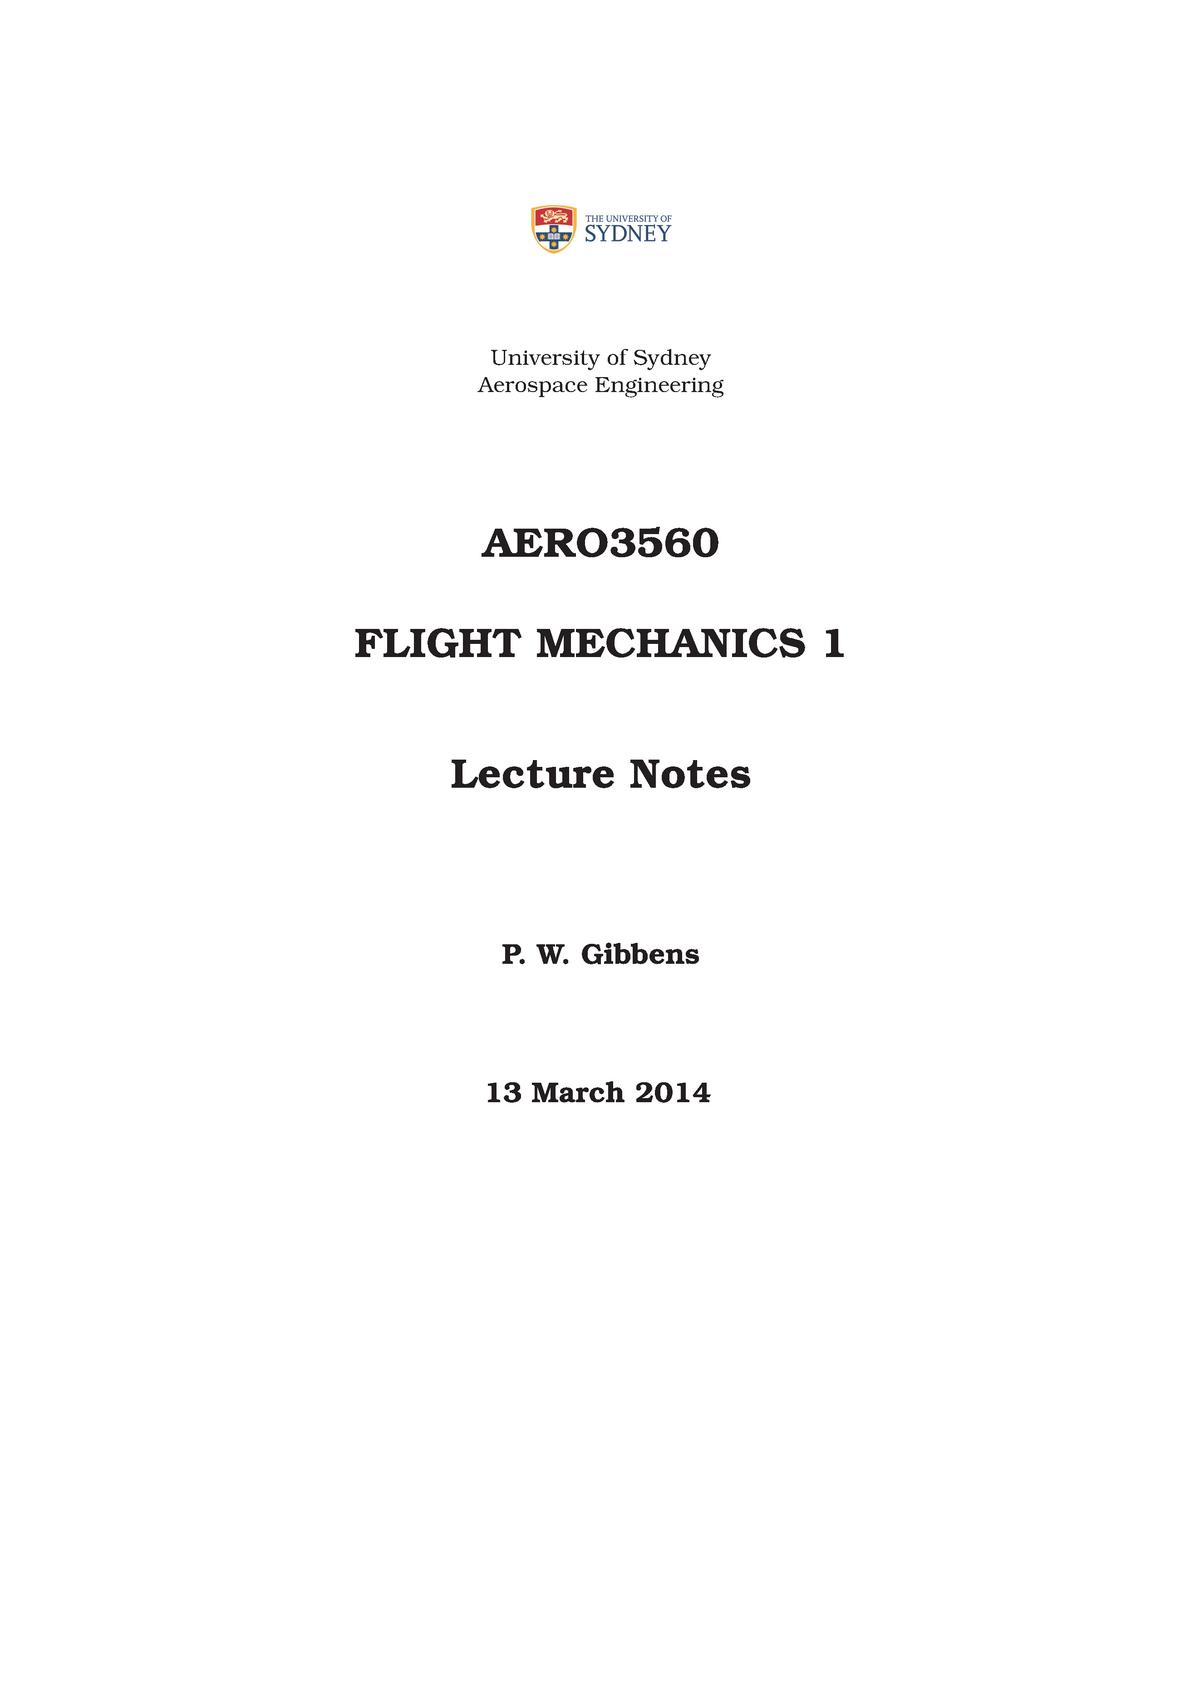 Summary - aero3560 - course notes 2015 - Flight Mechanics 1